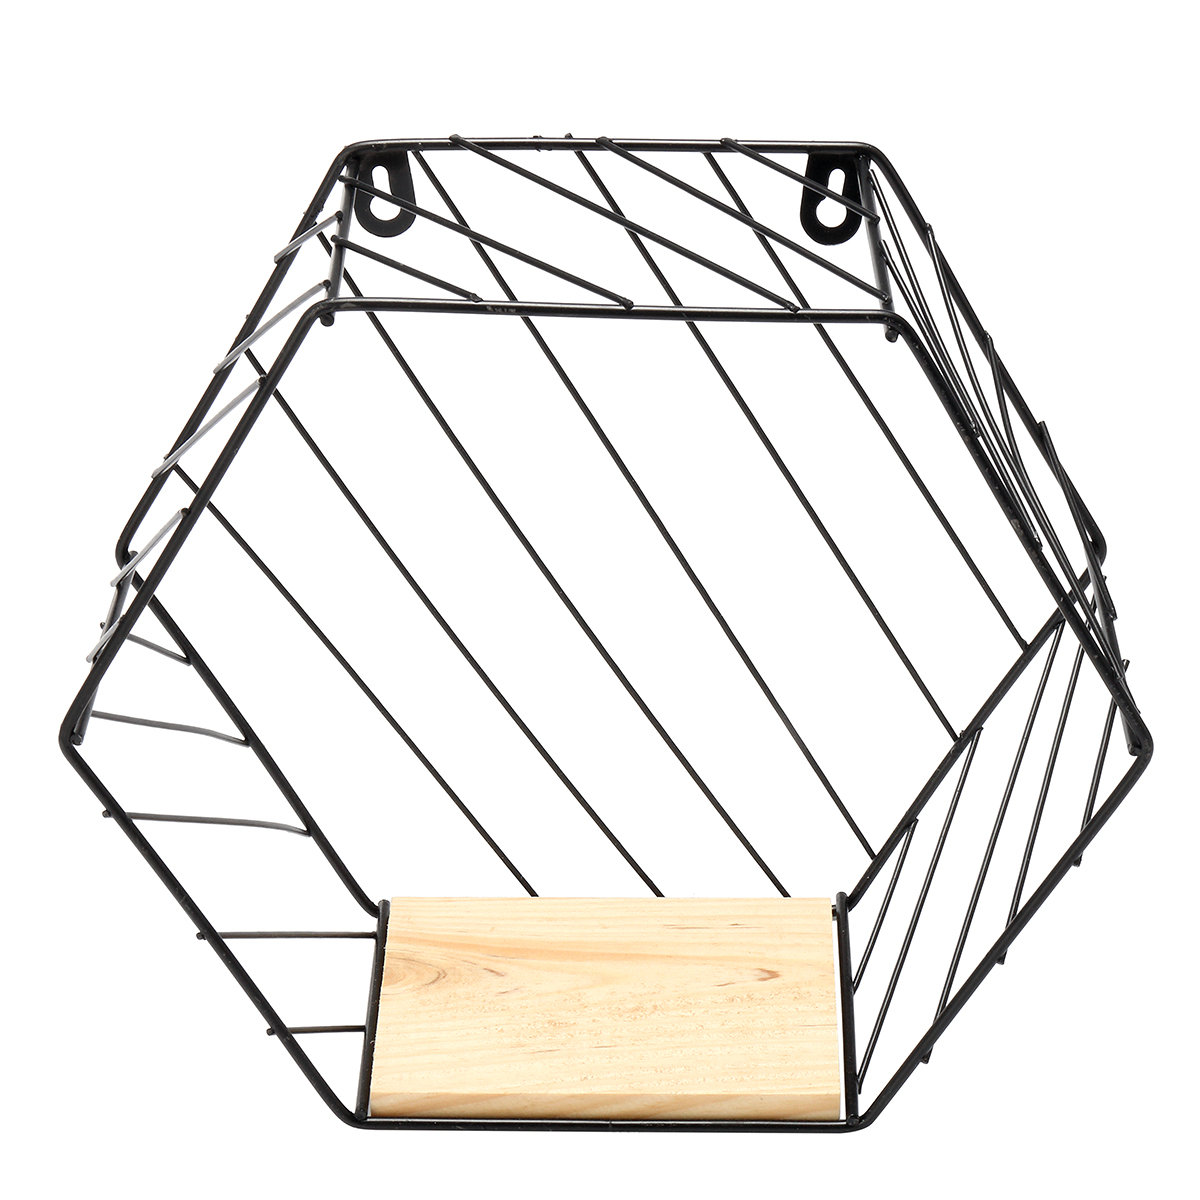 Iron Hexagon Wall Wire Shelf Holder Twill Trellis Design Home Decor